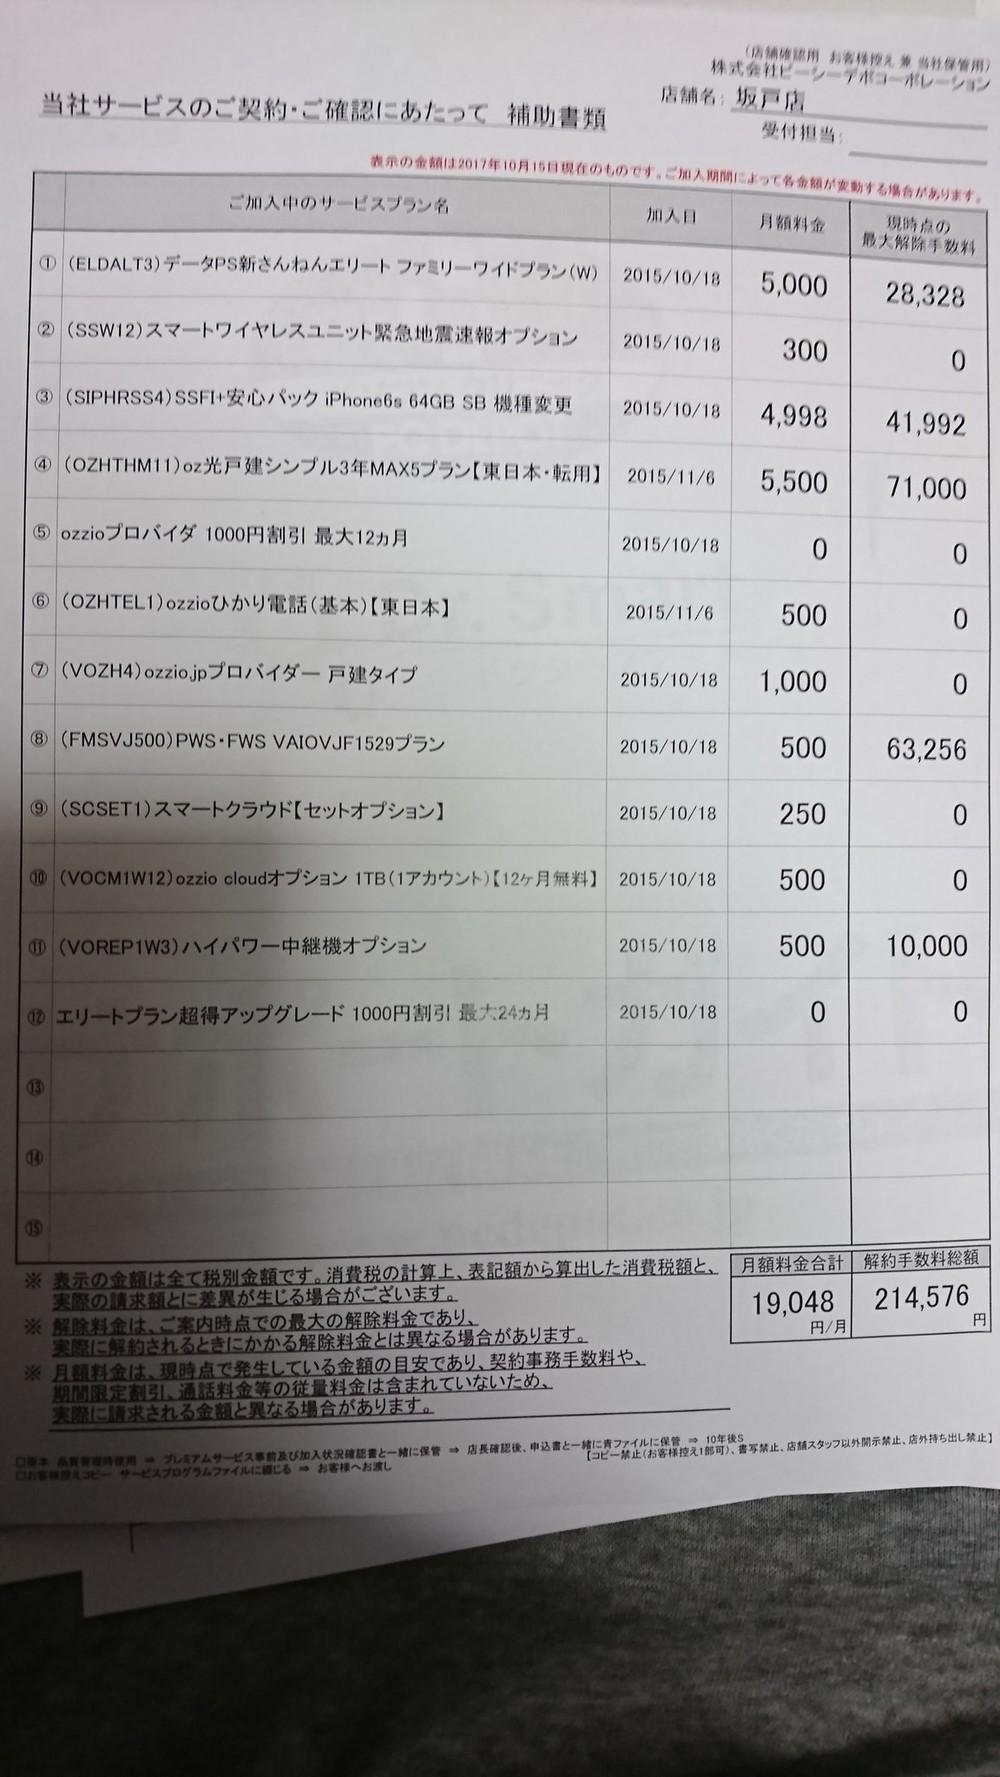 PCデポ「解約金」への不満ツイートが拡散 約21万円請求......企業側は「正規の対応」と説明